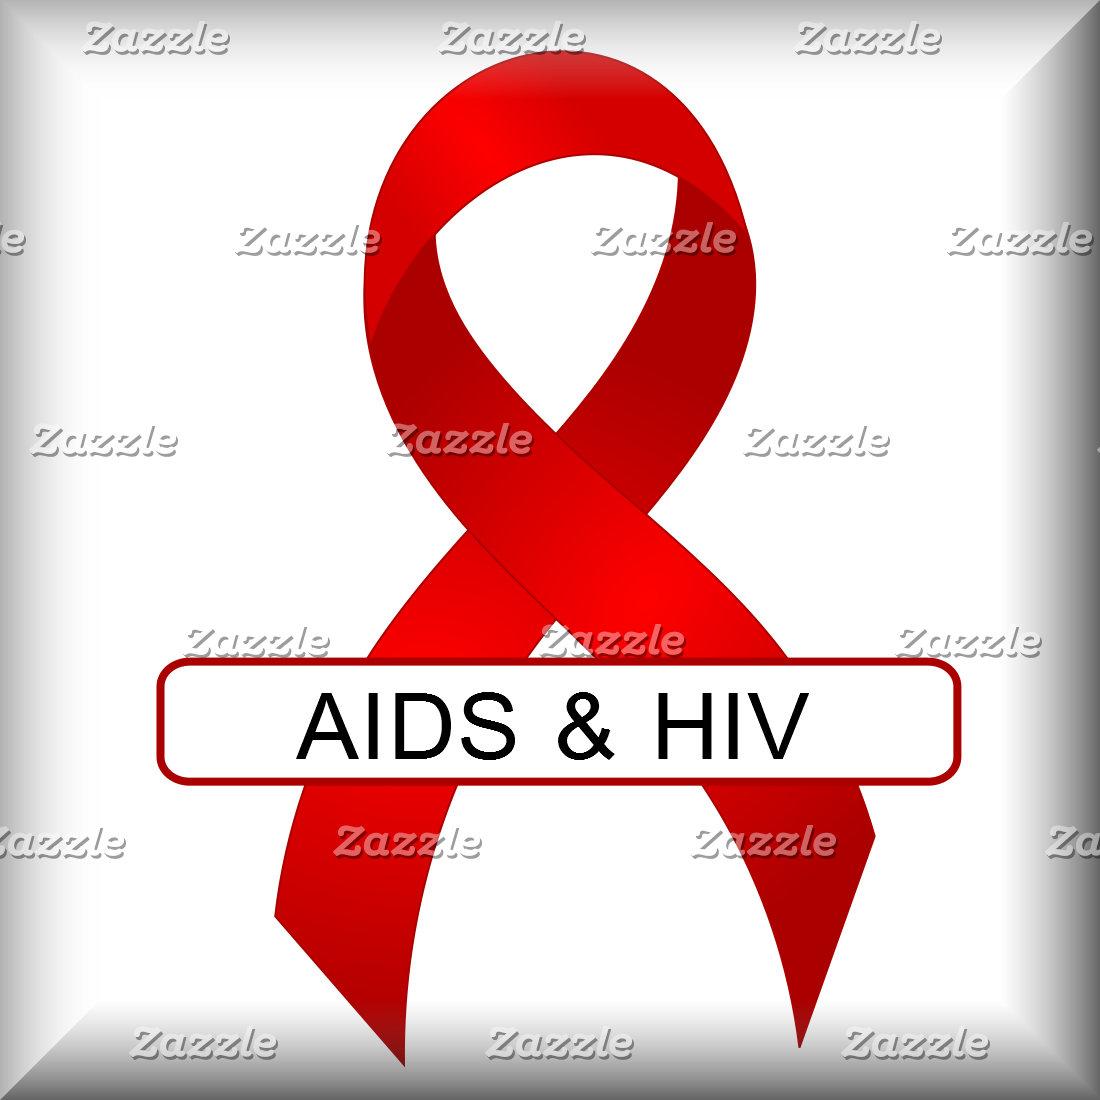 AIDS & HIV